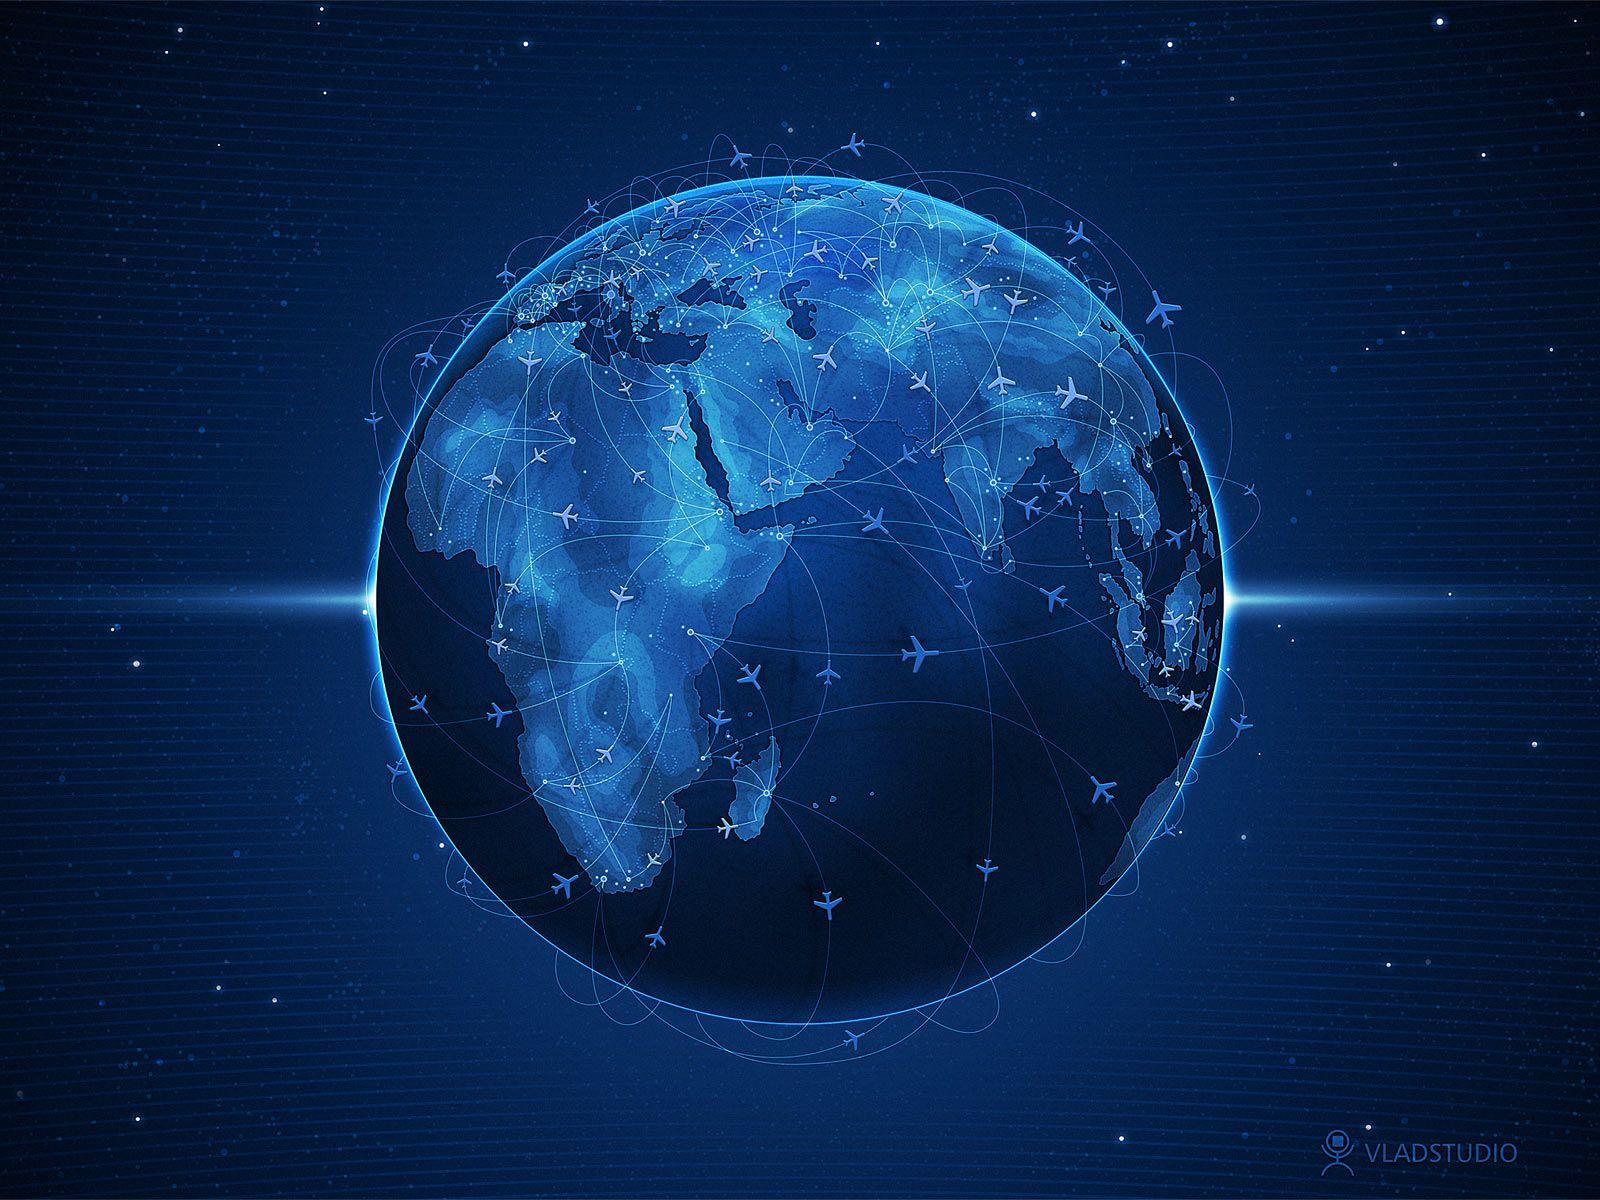 Dark Blue Globe Wallpaper 1600x1200 Fond Ecran S4 Wallpaper Ecran